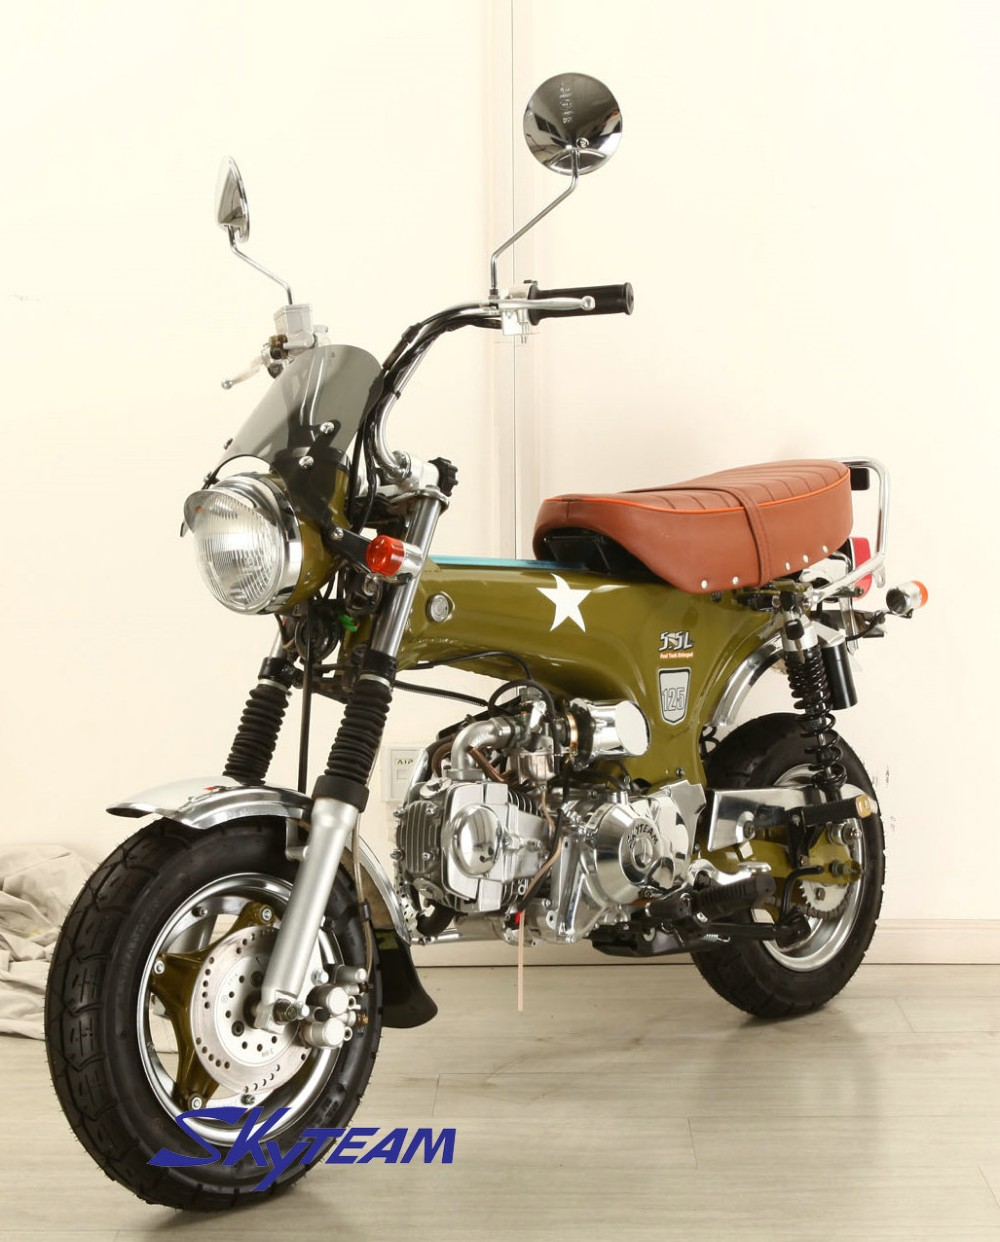 skyteam motorbike hobbiesxstyle. Black Bedroom Furniture Sets. Home Design Ideas